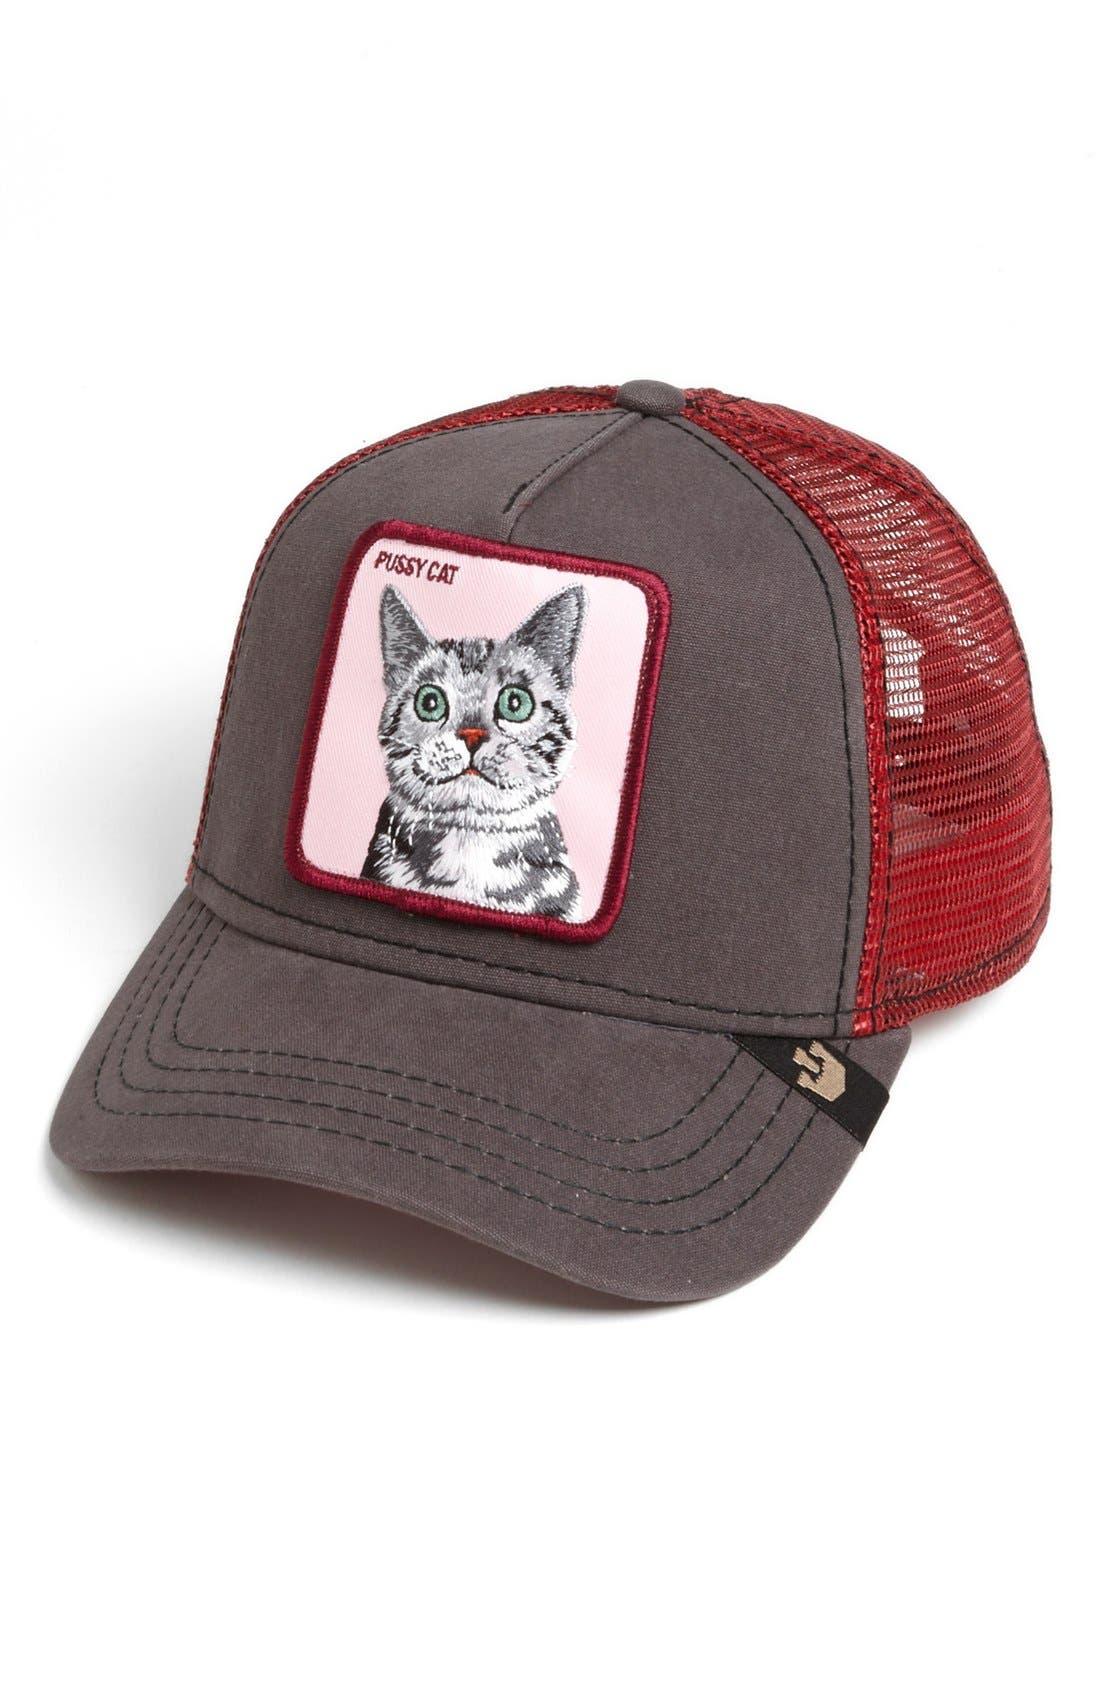 Main Image - Goorin Brothers 'Animal Farm - Whiskers Cat' Trucker Hat